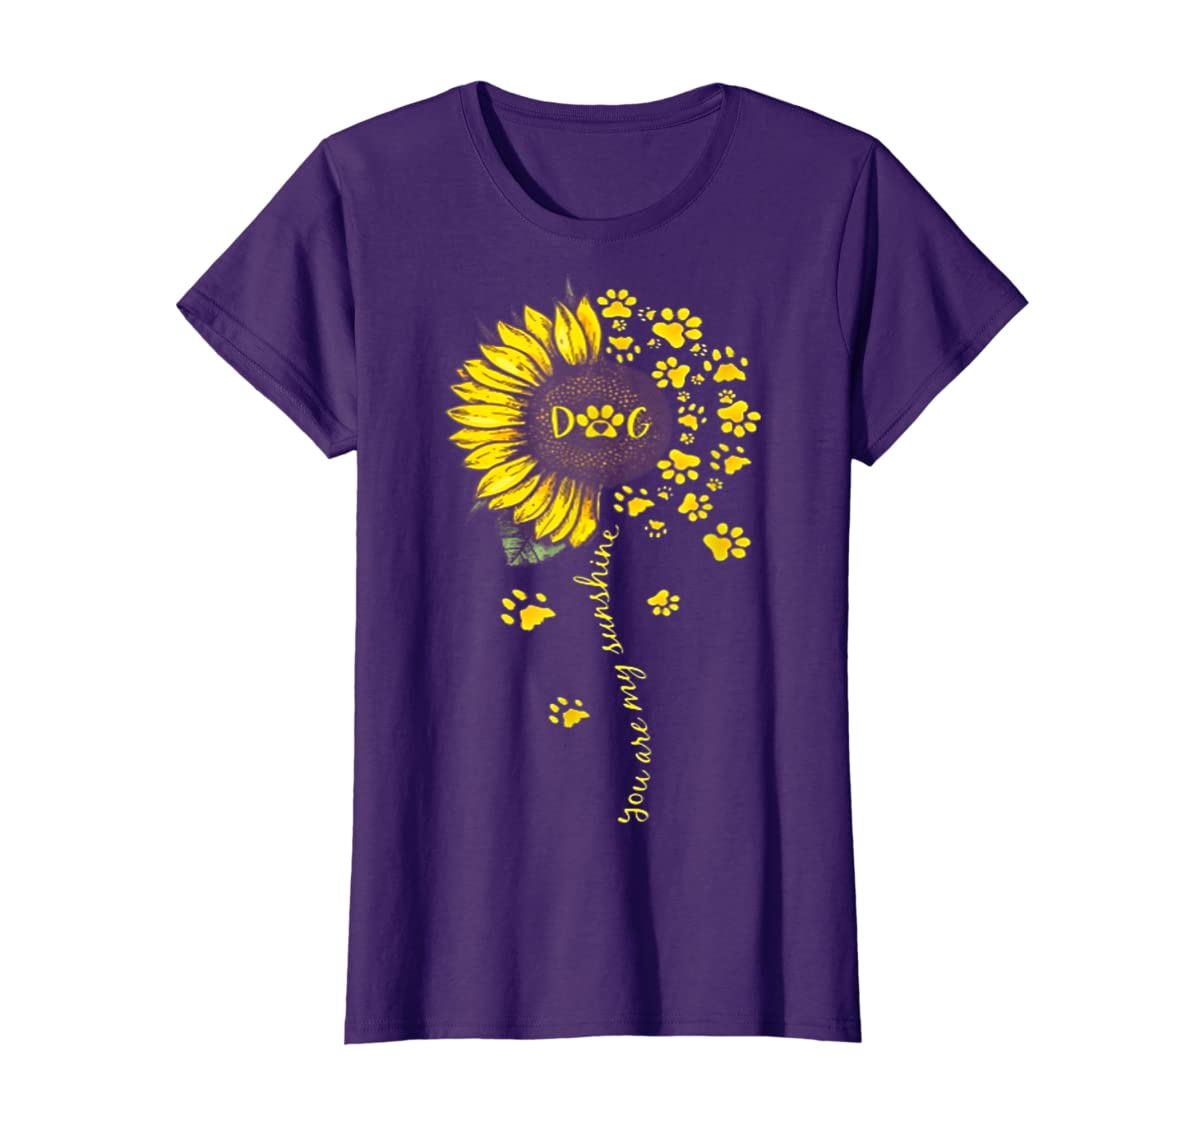 You Are My Sunshine Dog Tshirt-Women's T-Shirt-Purple